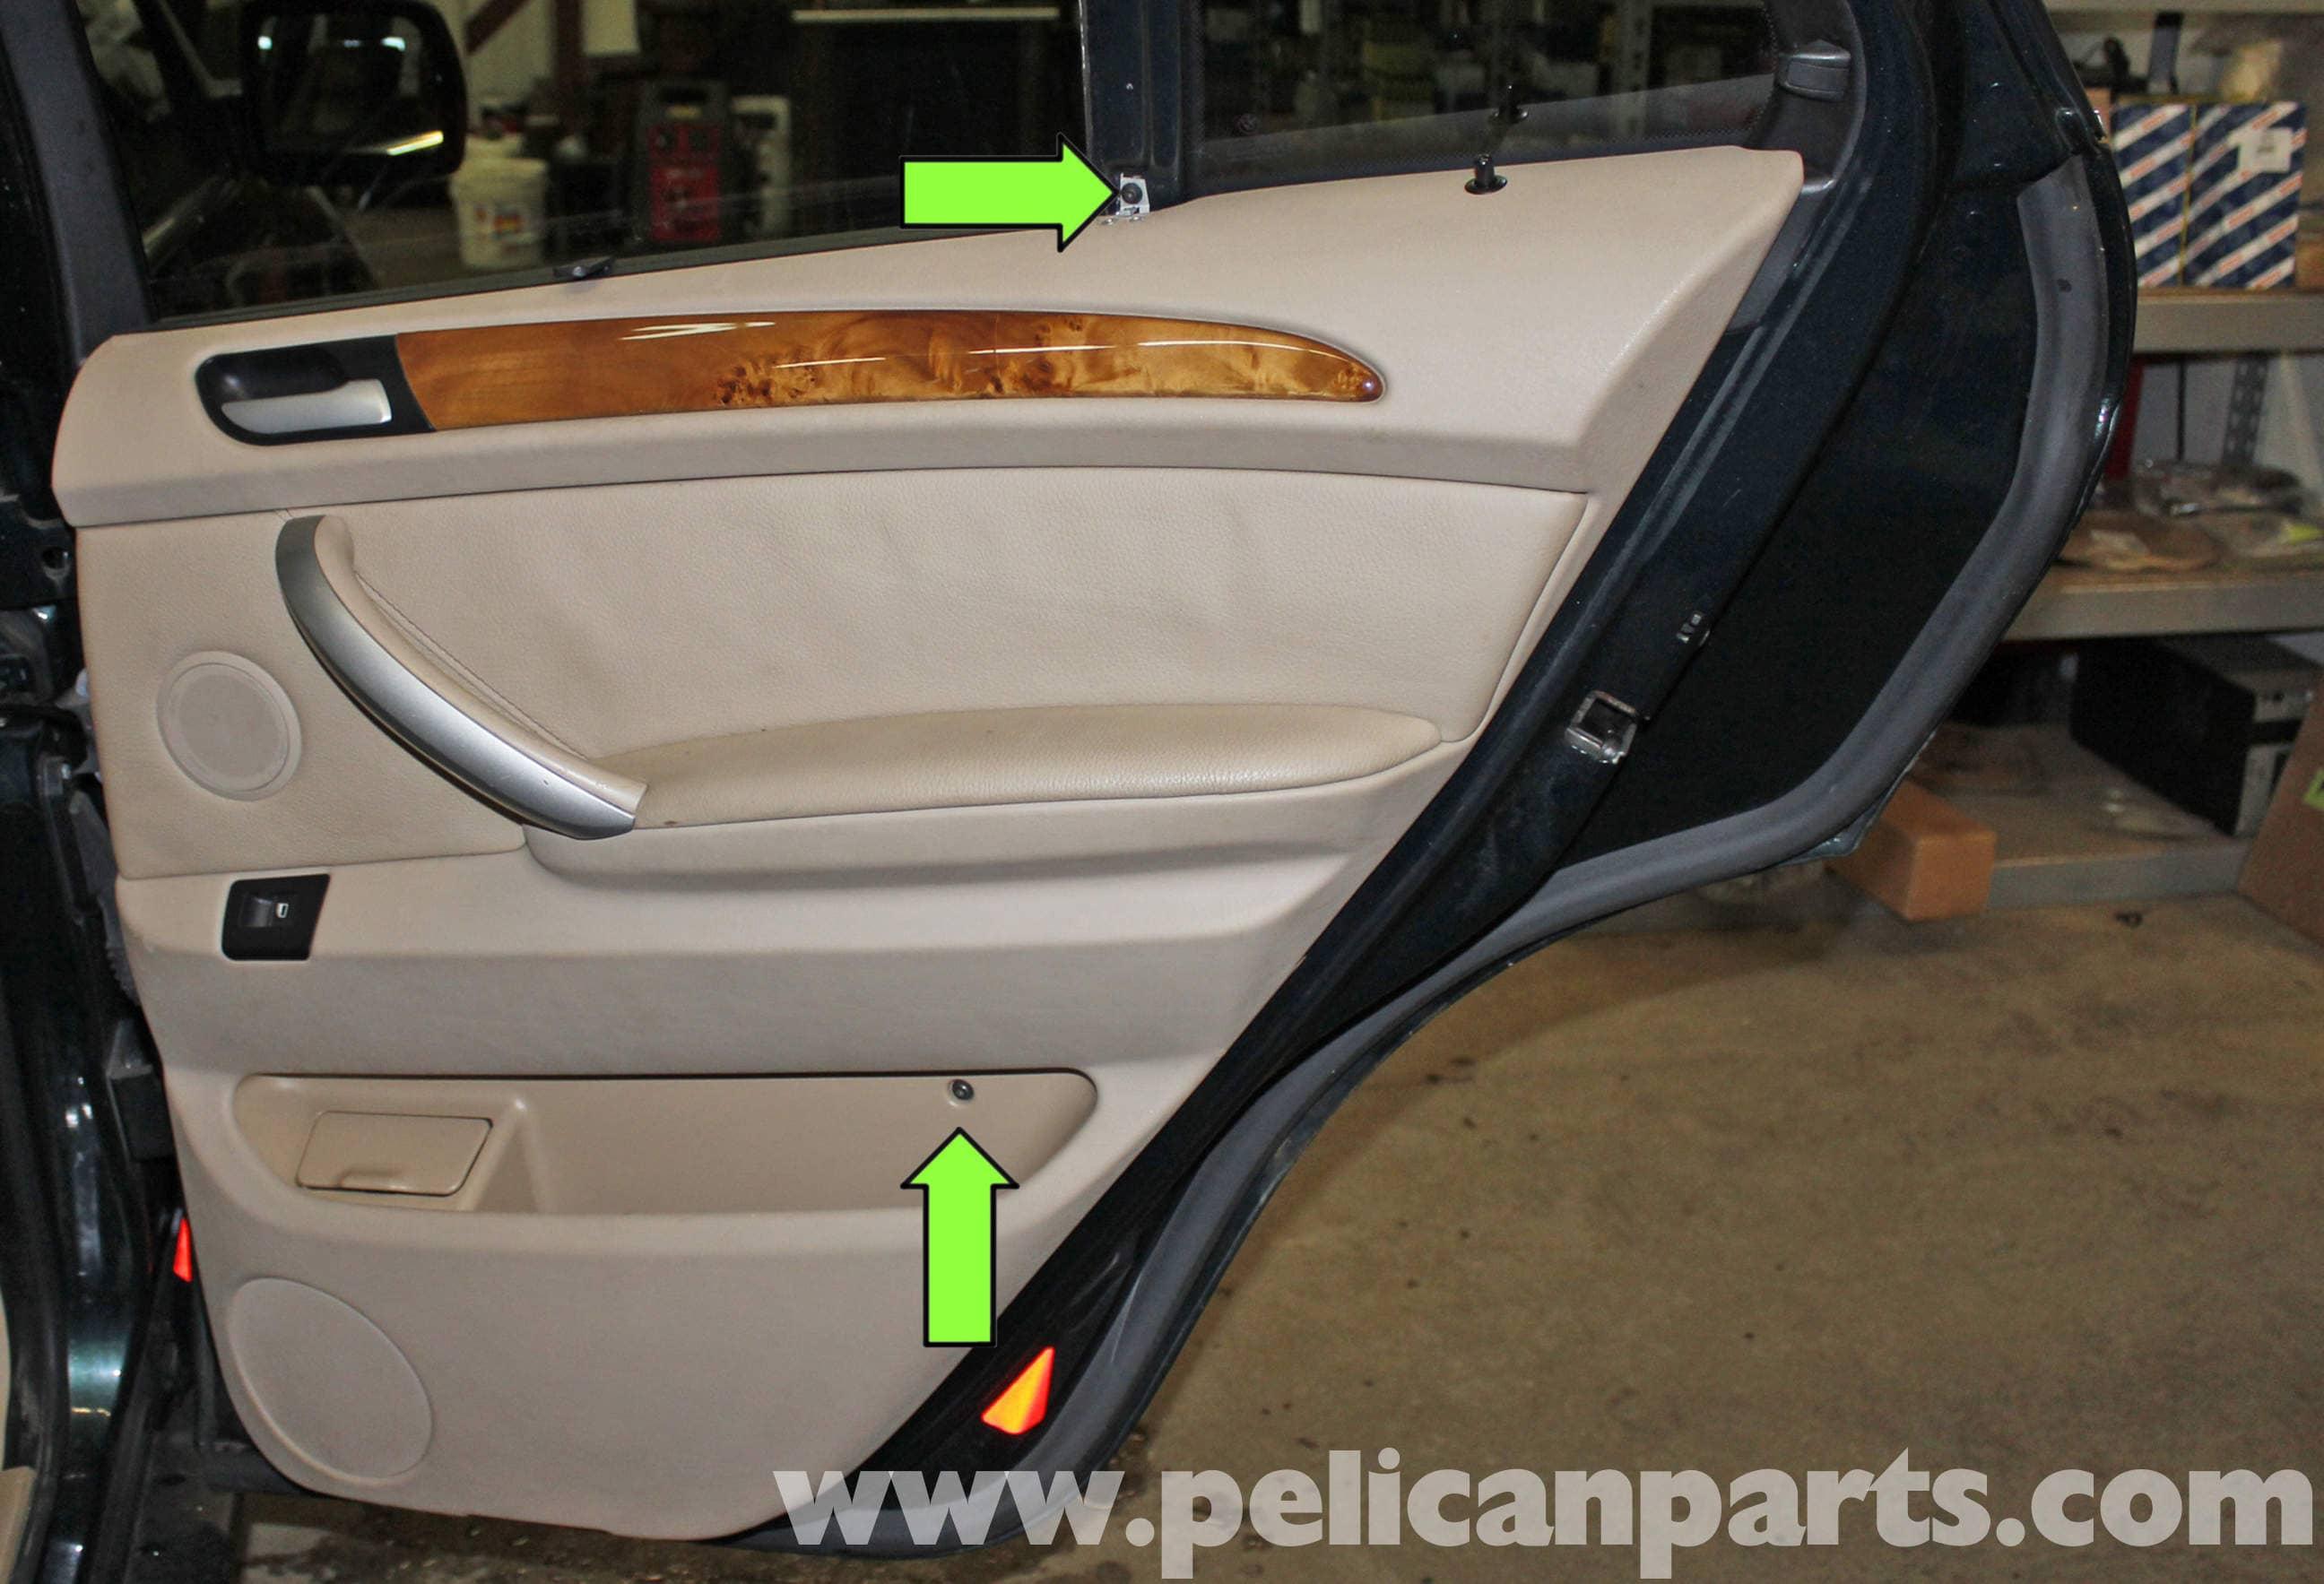 BMW X5 Rear Door Panel Replacement (E53 2000 - 2006